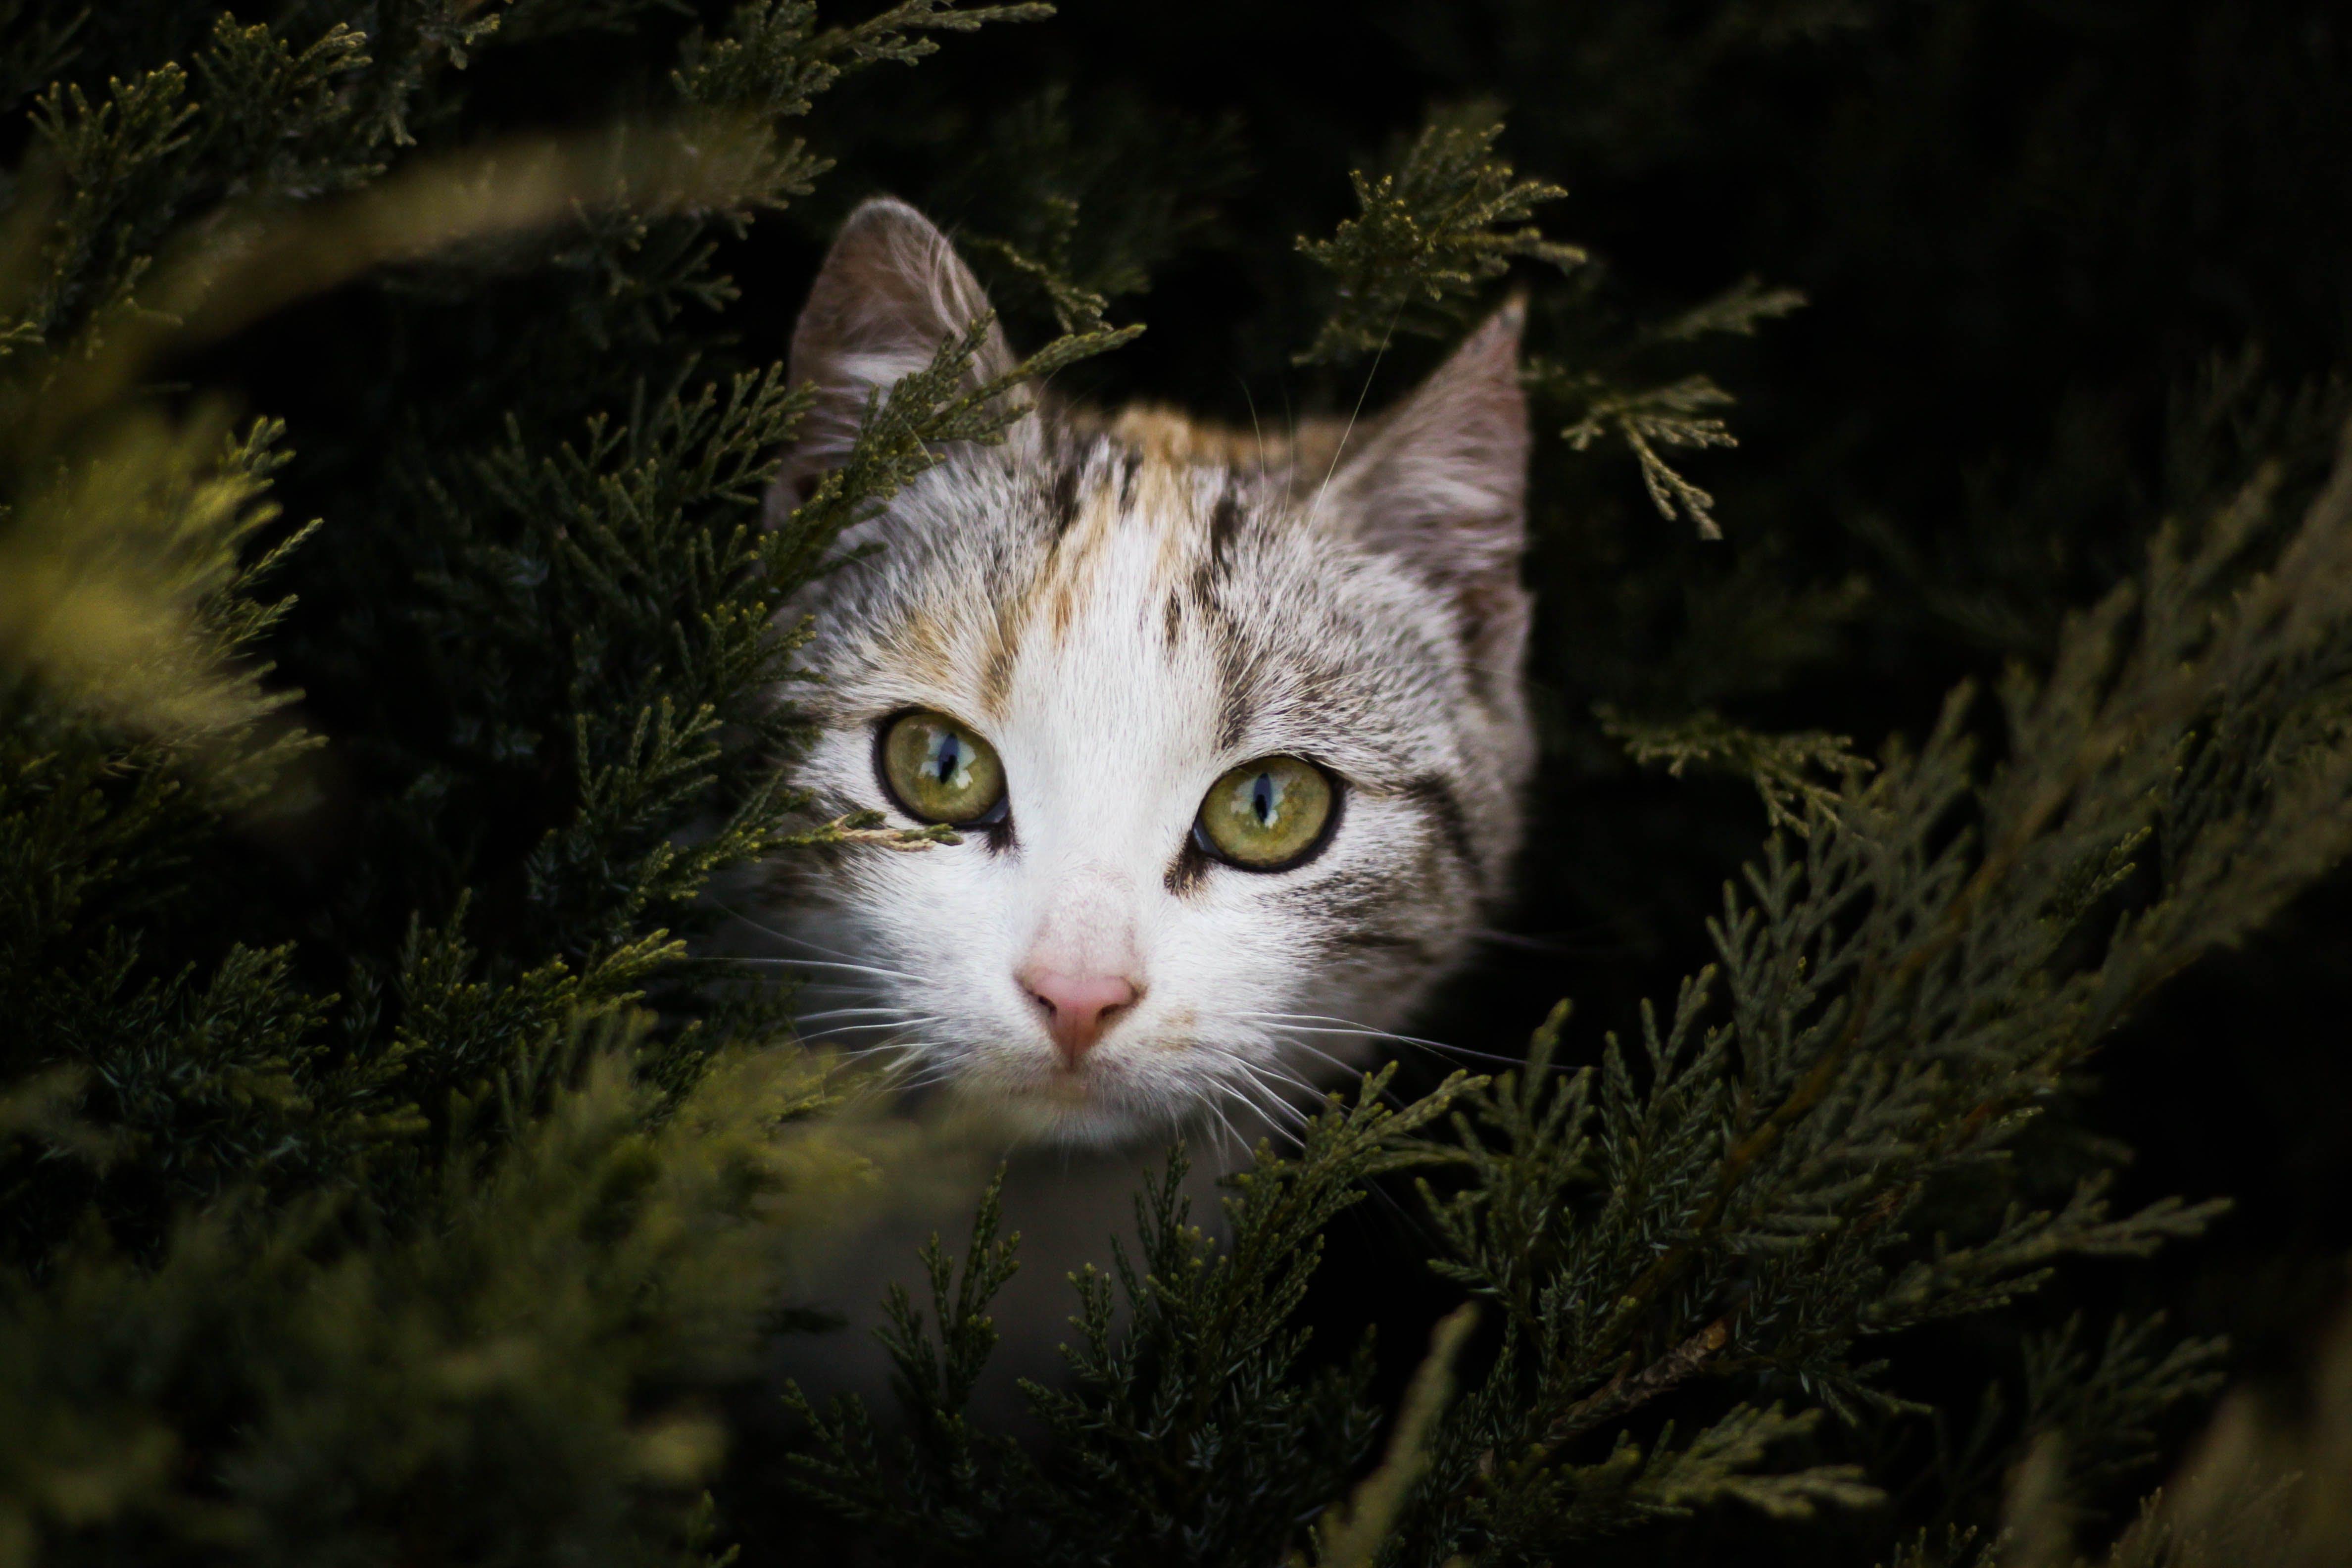 Focus Photography of Gray Orange and Black Kitten Beside Green Plant